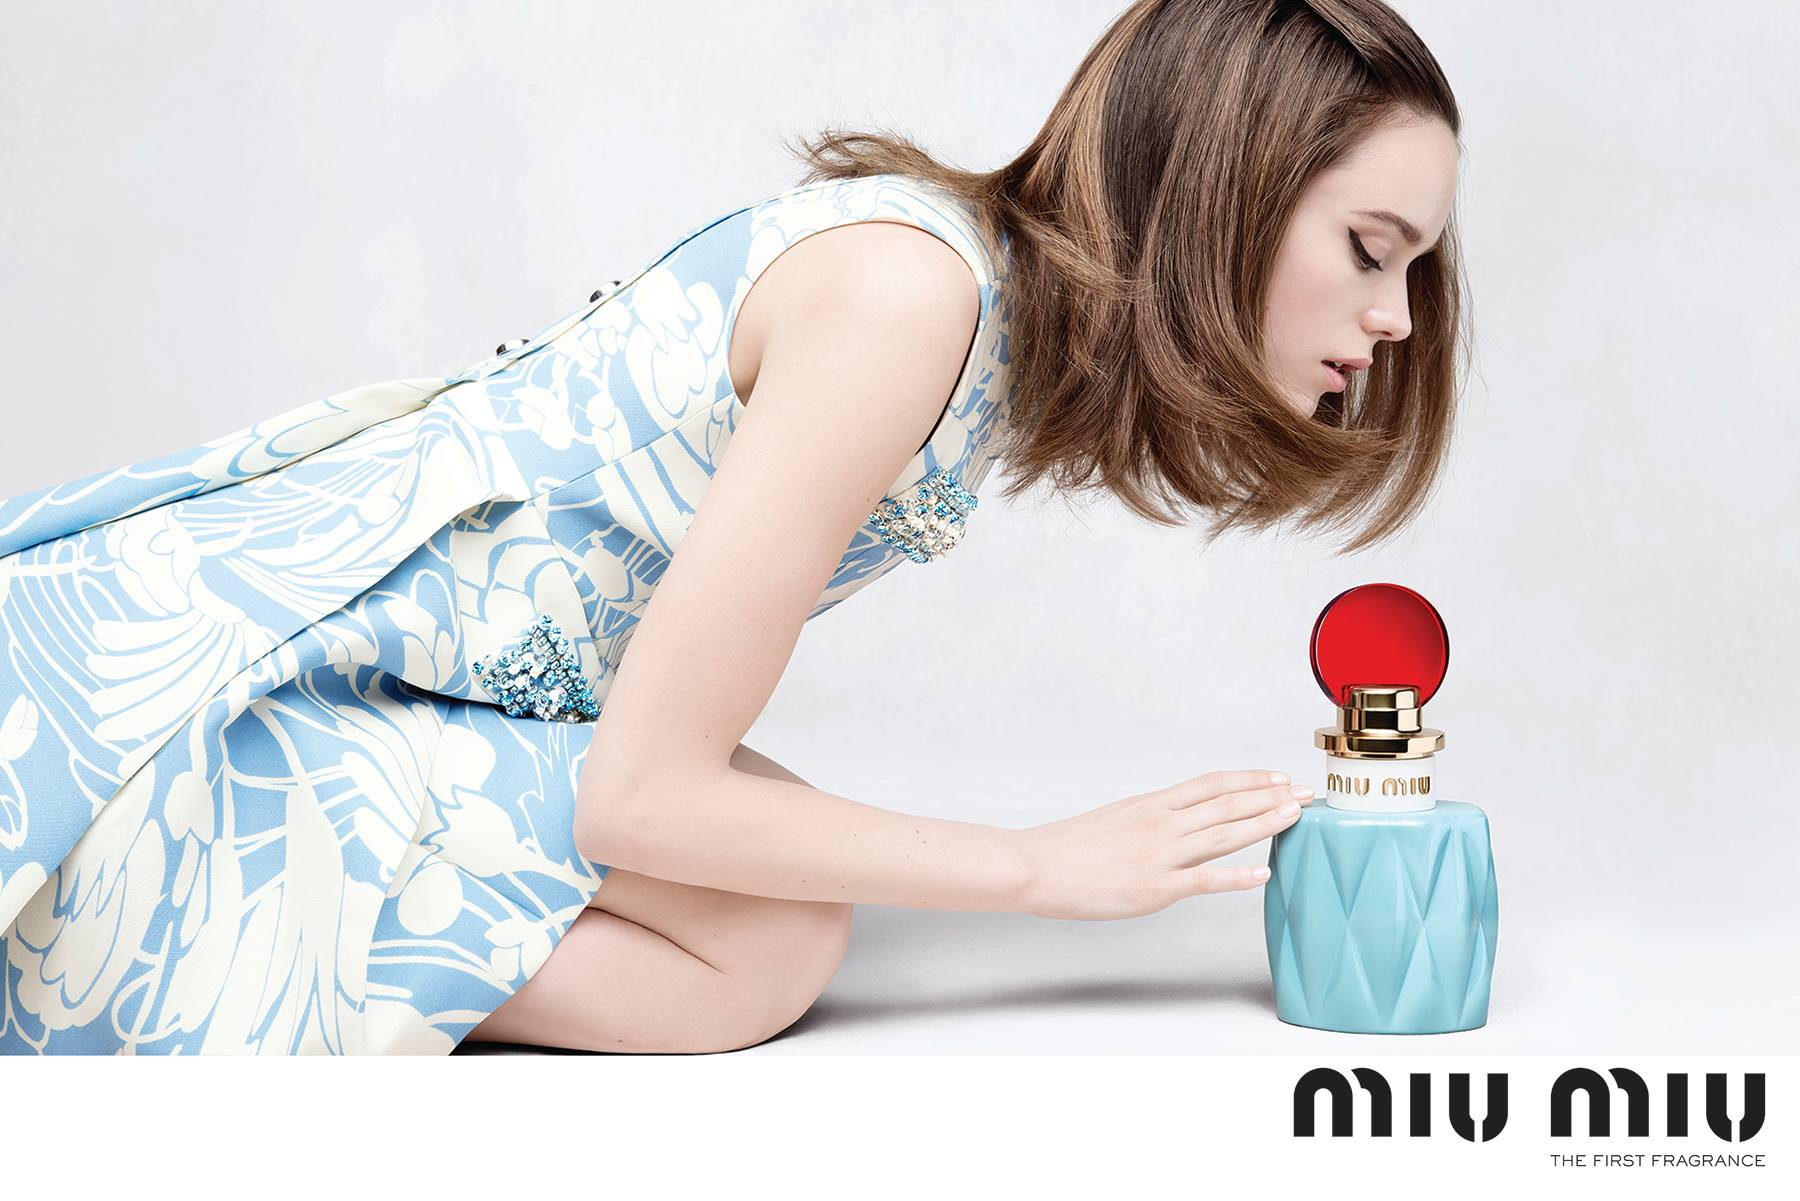 miu-miu-fragrance-campaign-stacy-martin.jpg